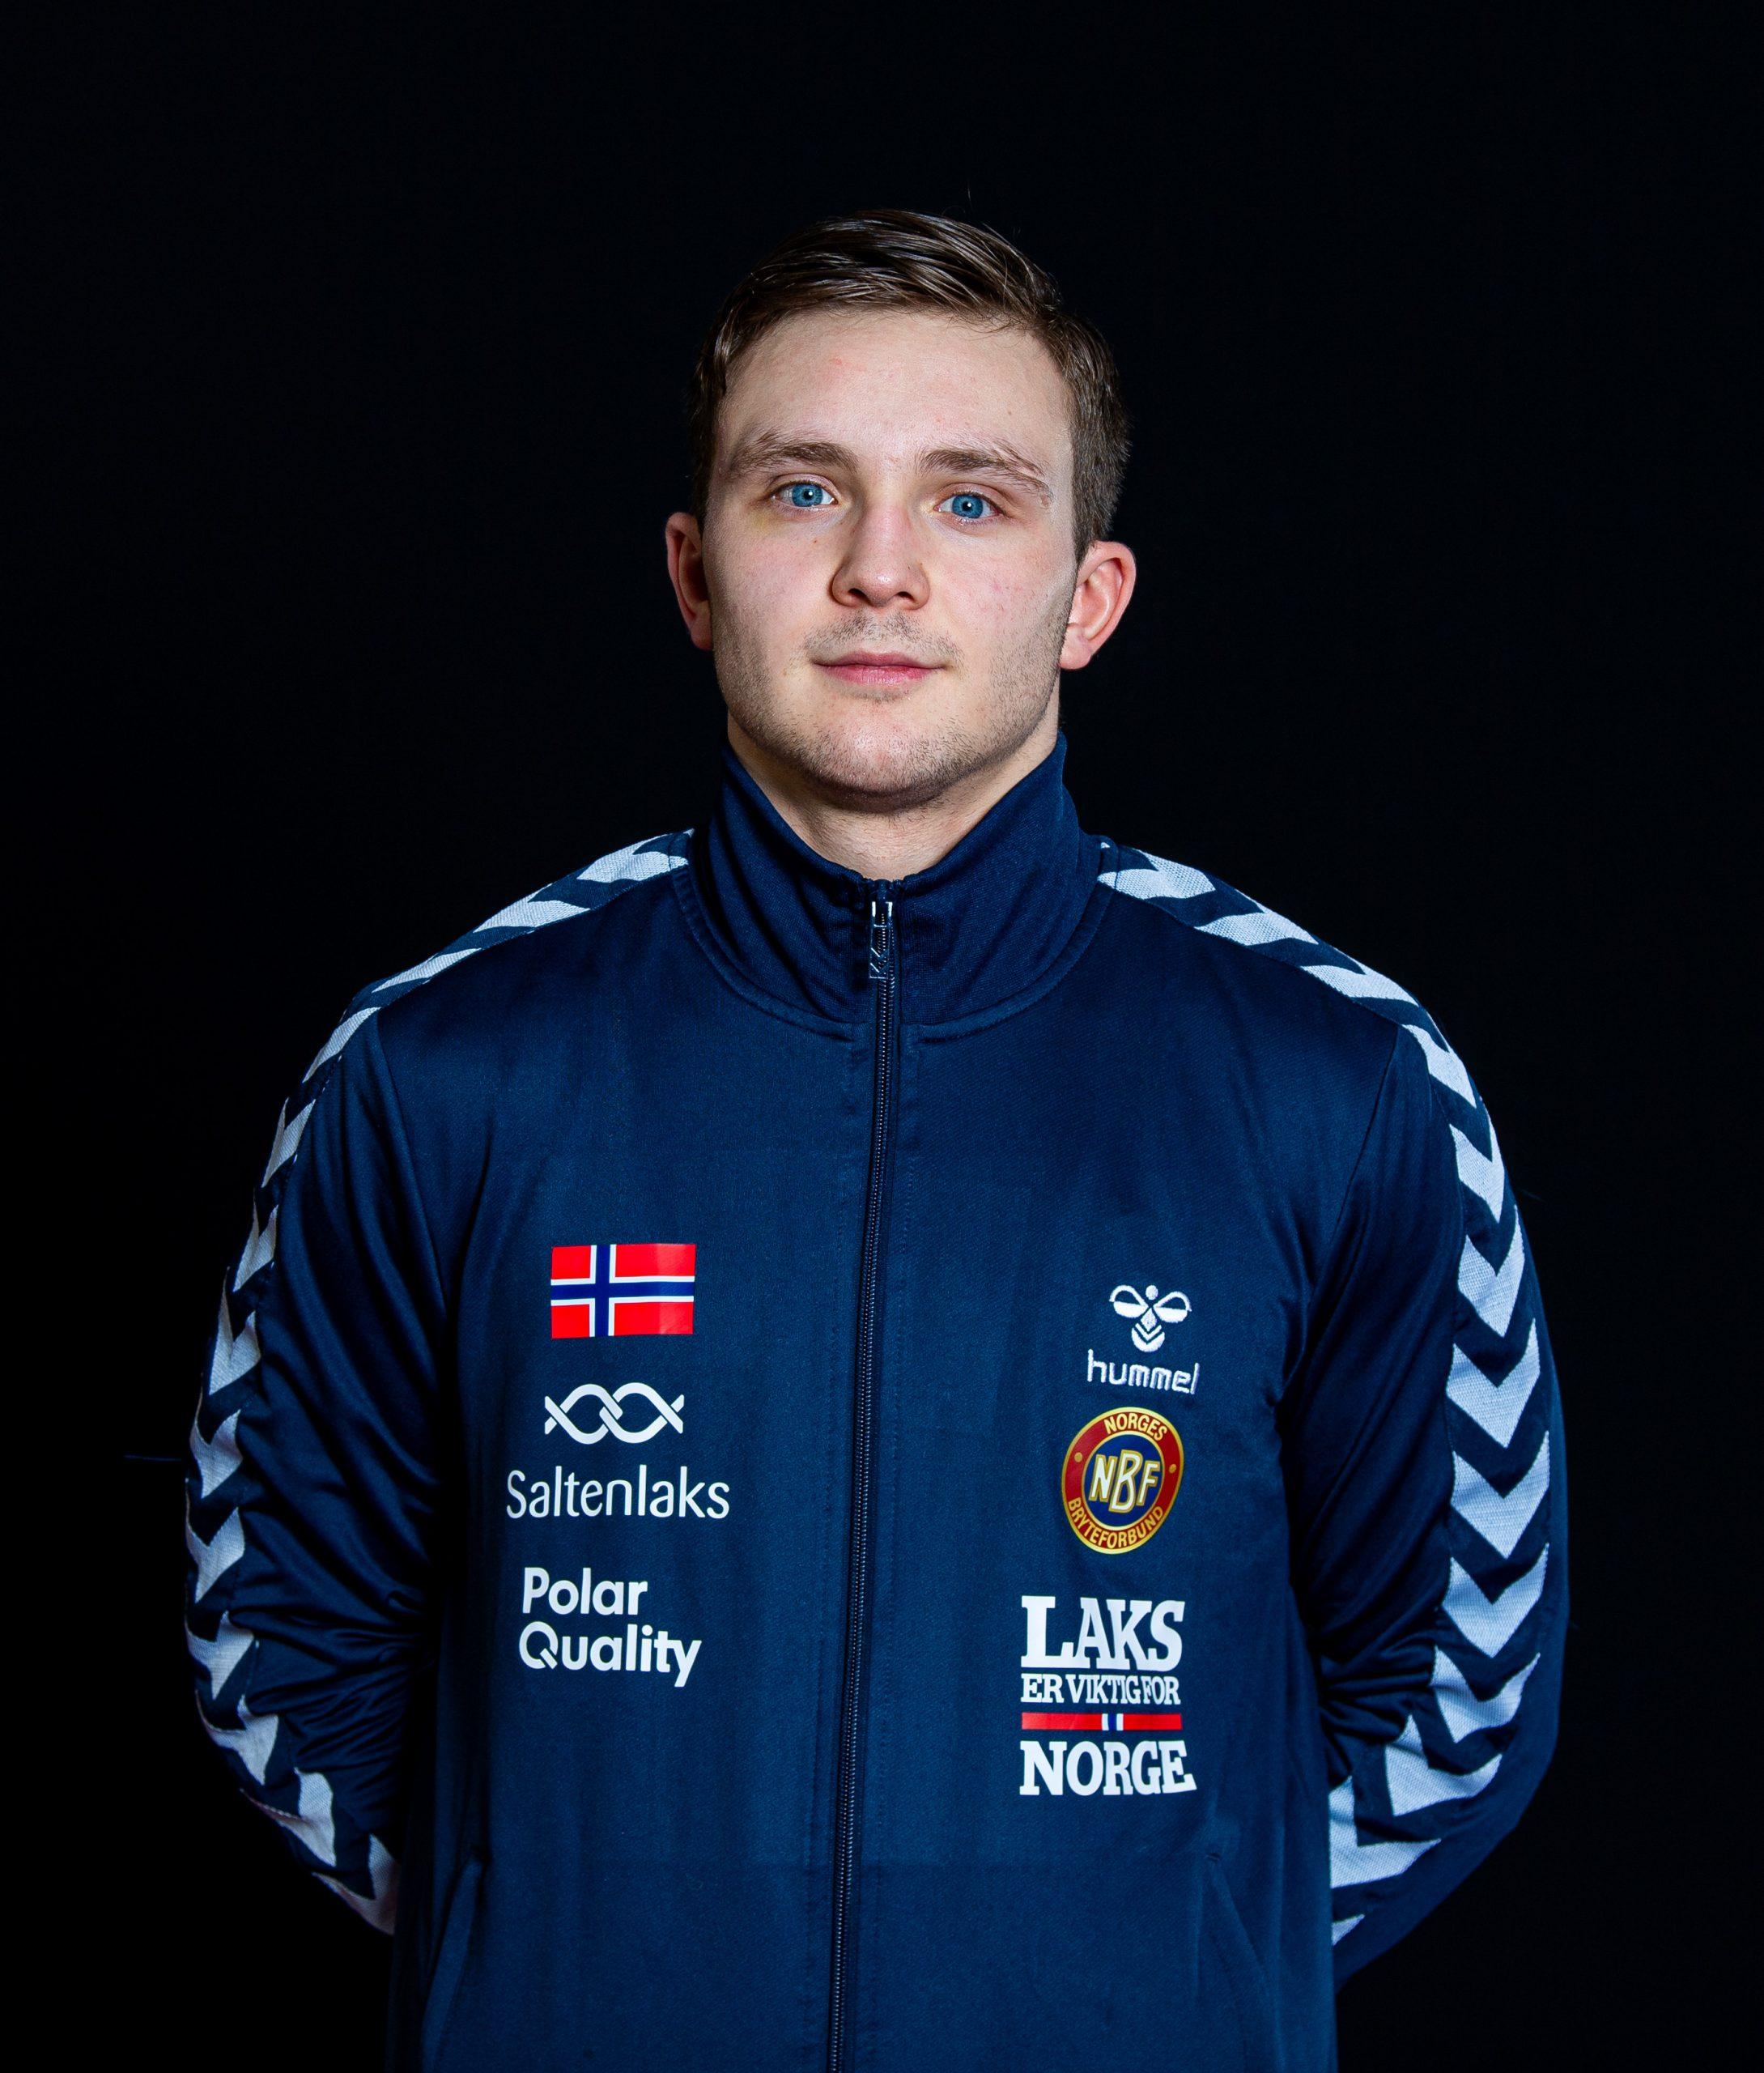 Mathias Næss